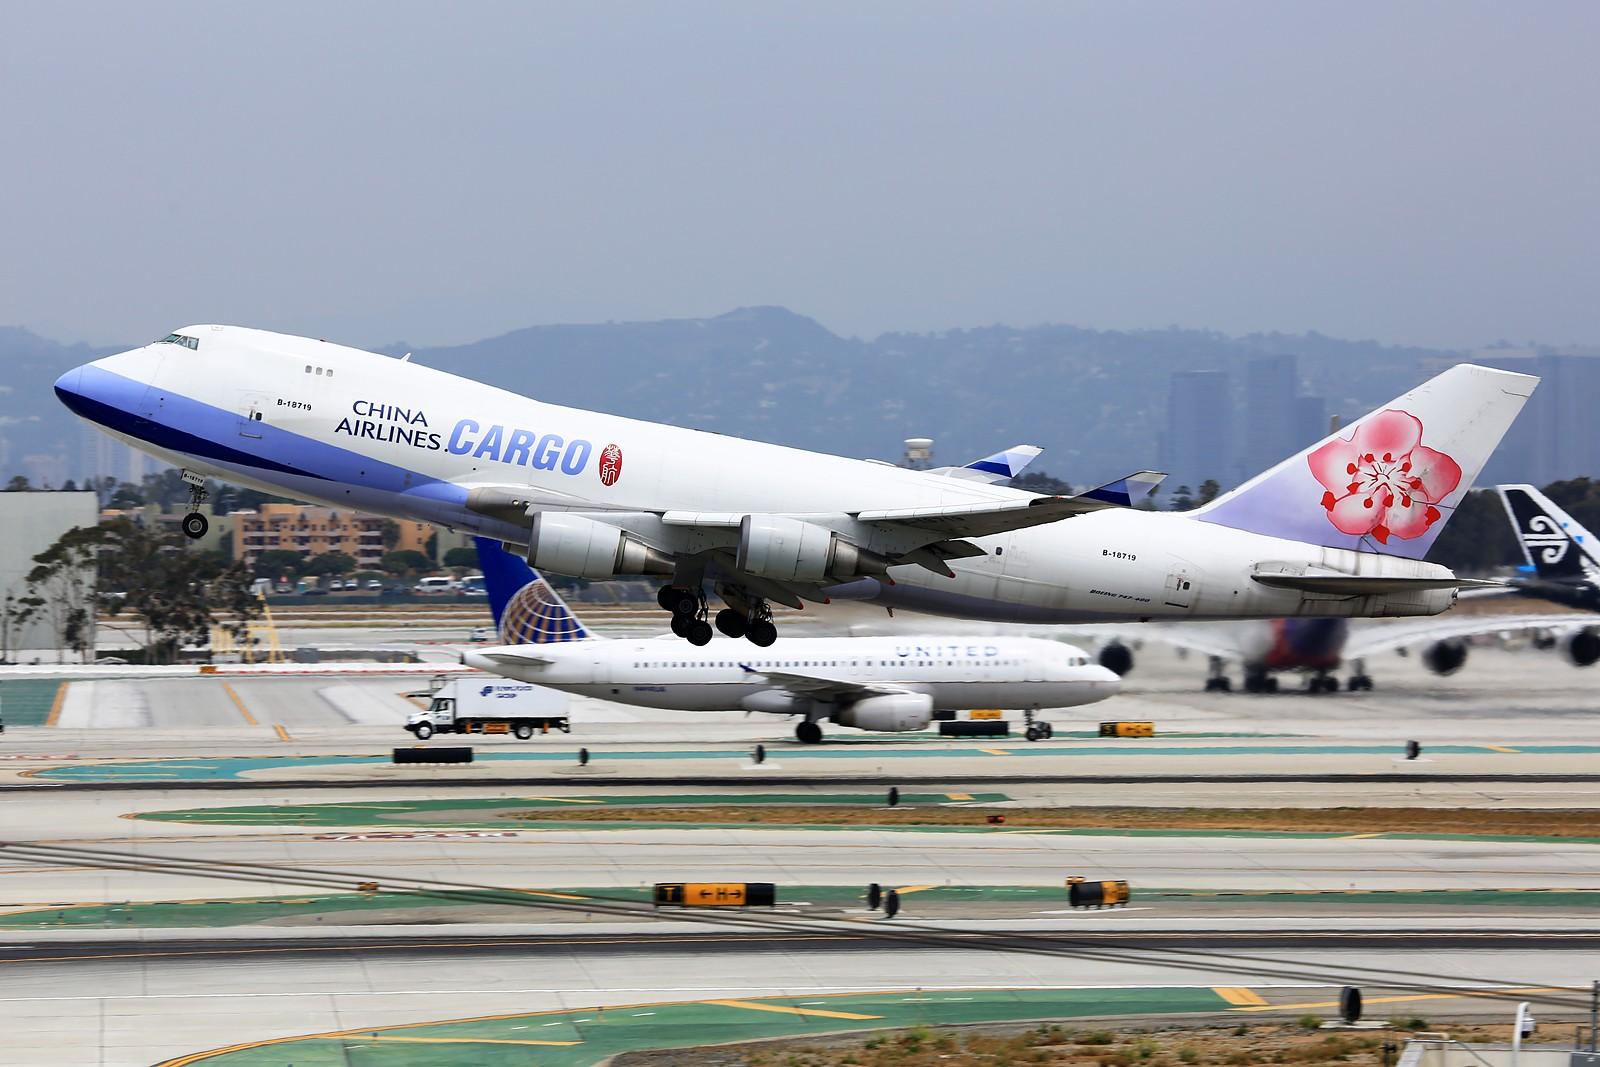 Re:[原创]【LAX】**********Imperial Hill小合集:重载拉起们的日常[1600*1067]********** BOEING 747-400F B-18719 美国洛杉矶机场